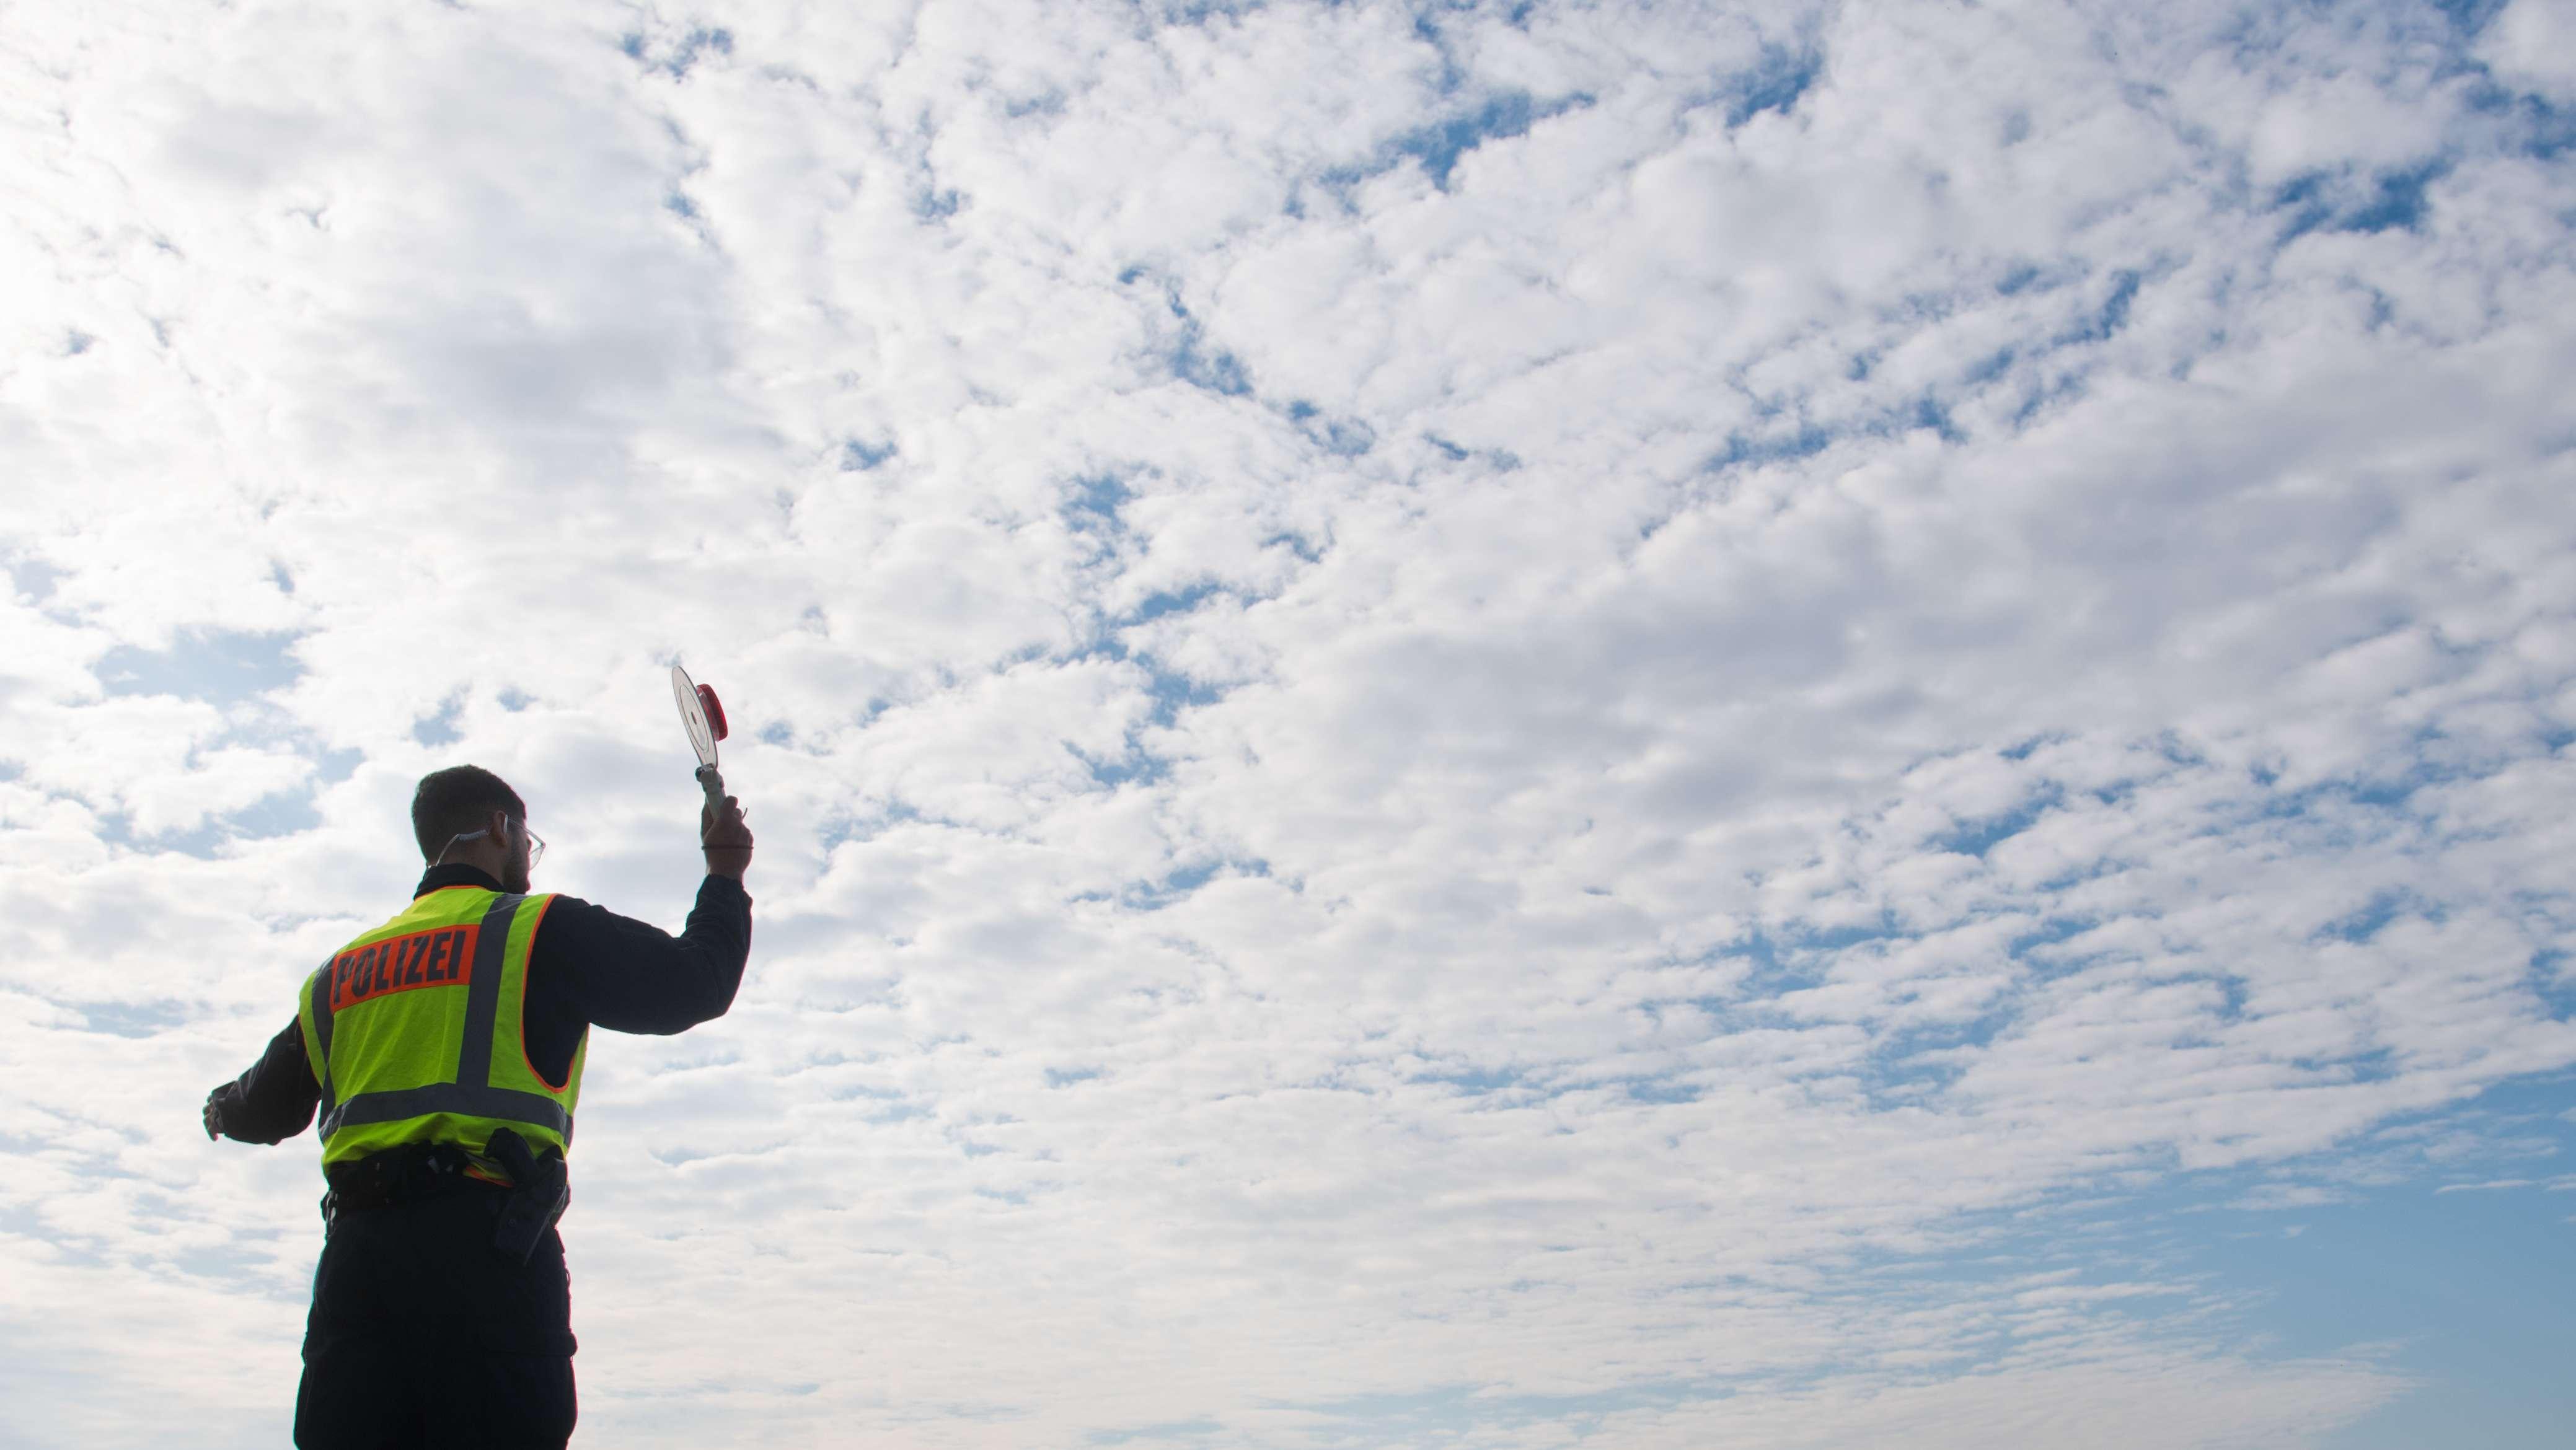 Polizist steht vor wolkenverhangenem Himmel (Symbolbild)